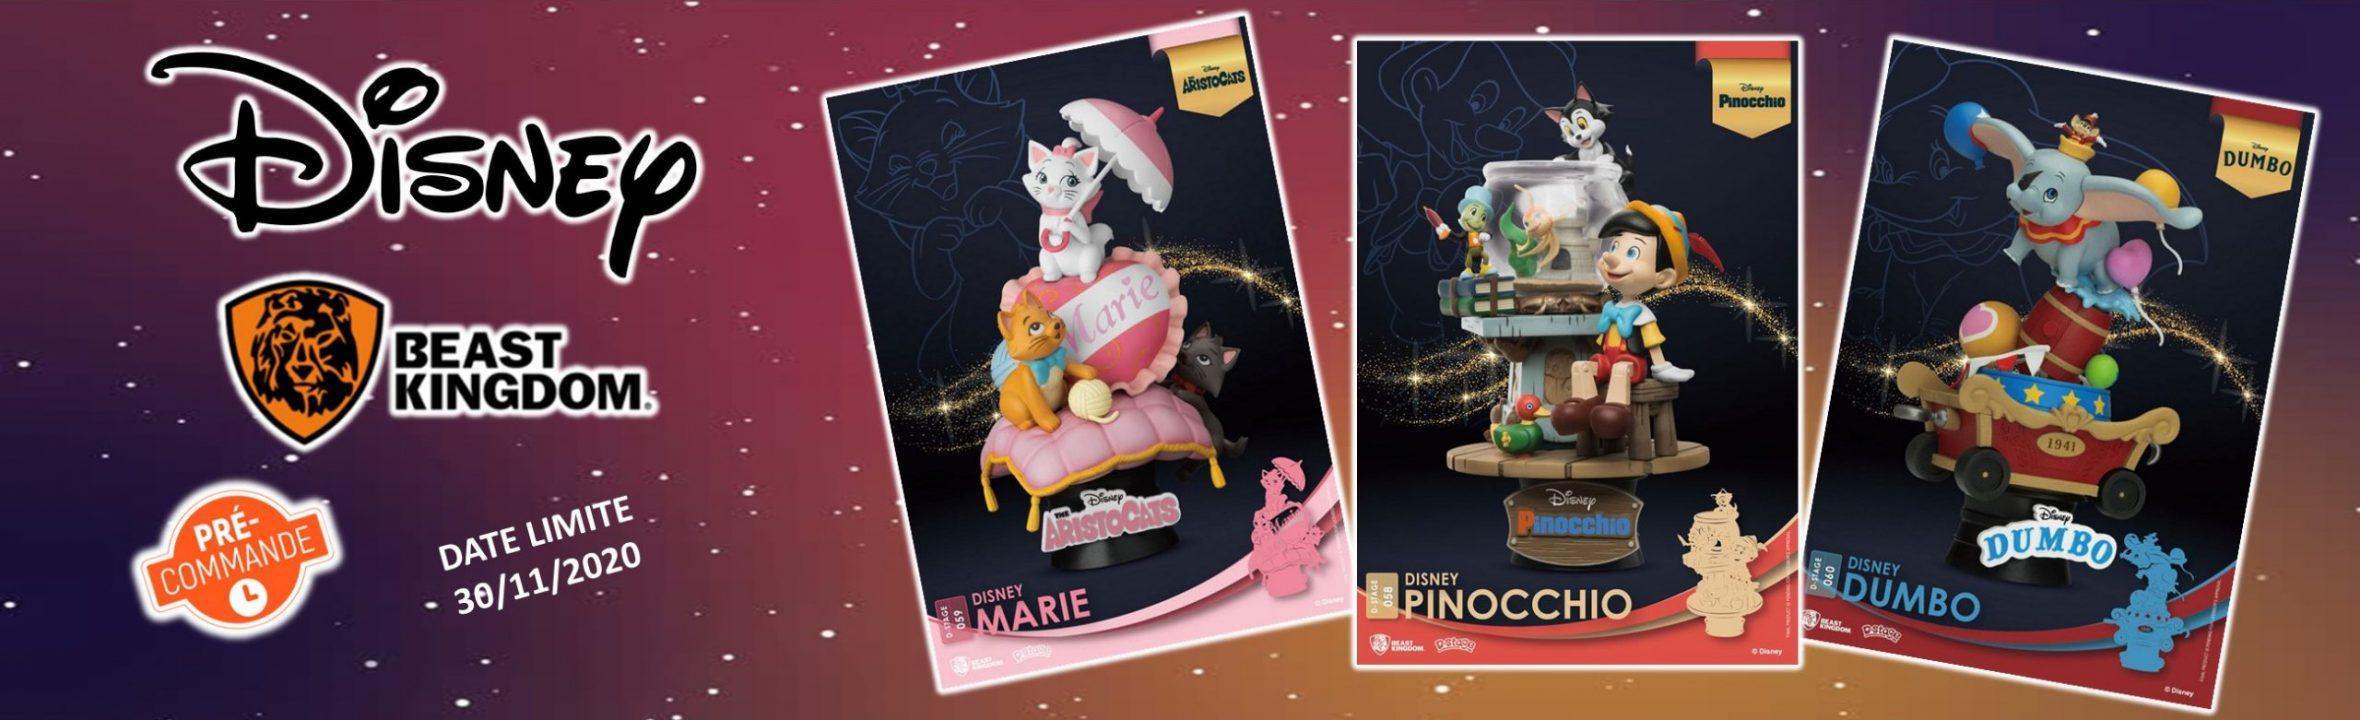 diorama dstage beast kingdom disney classics goodin shop